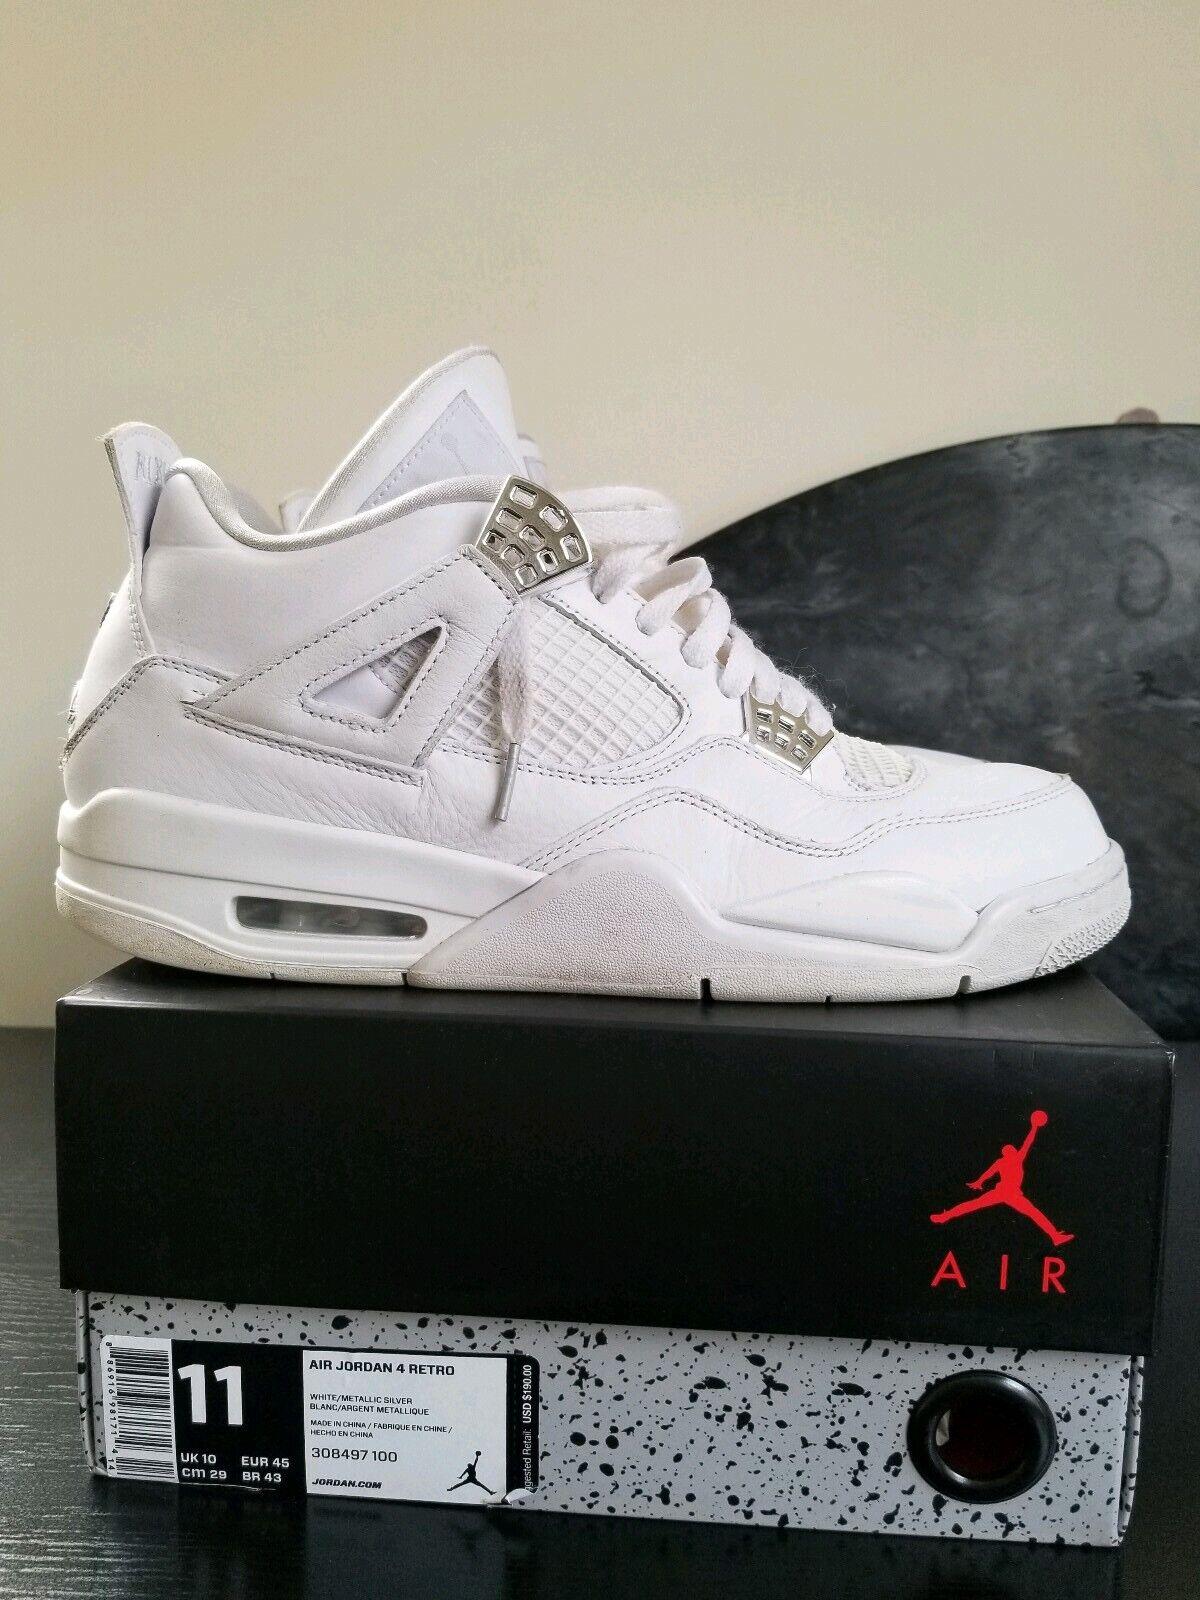 RARE Nike Air Jordan Retro 4 IV 2017 Pure Money WHITE Silver Basketball